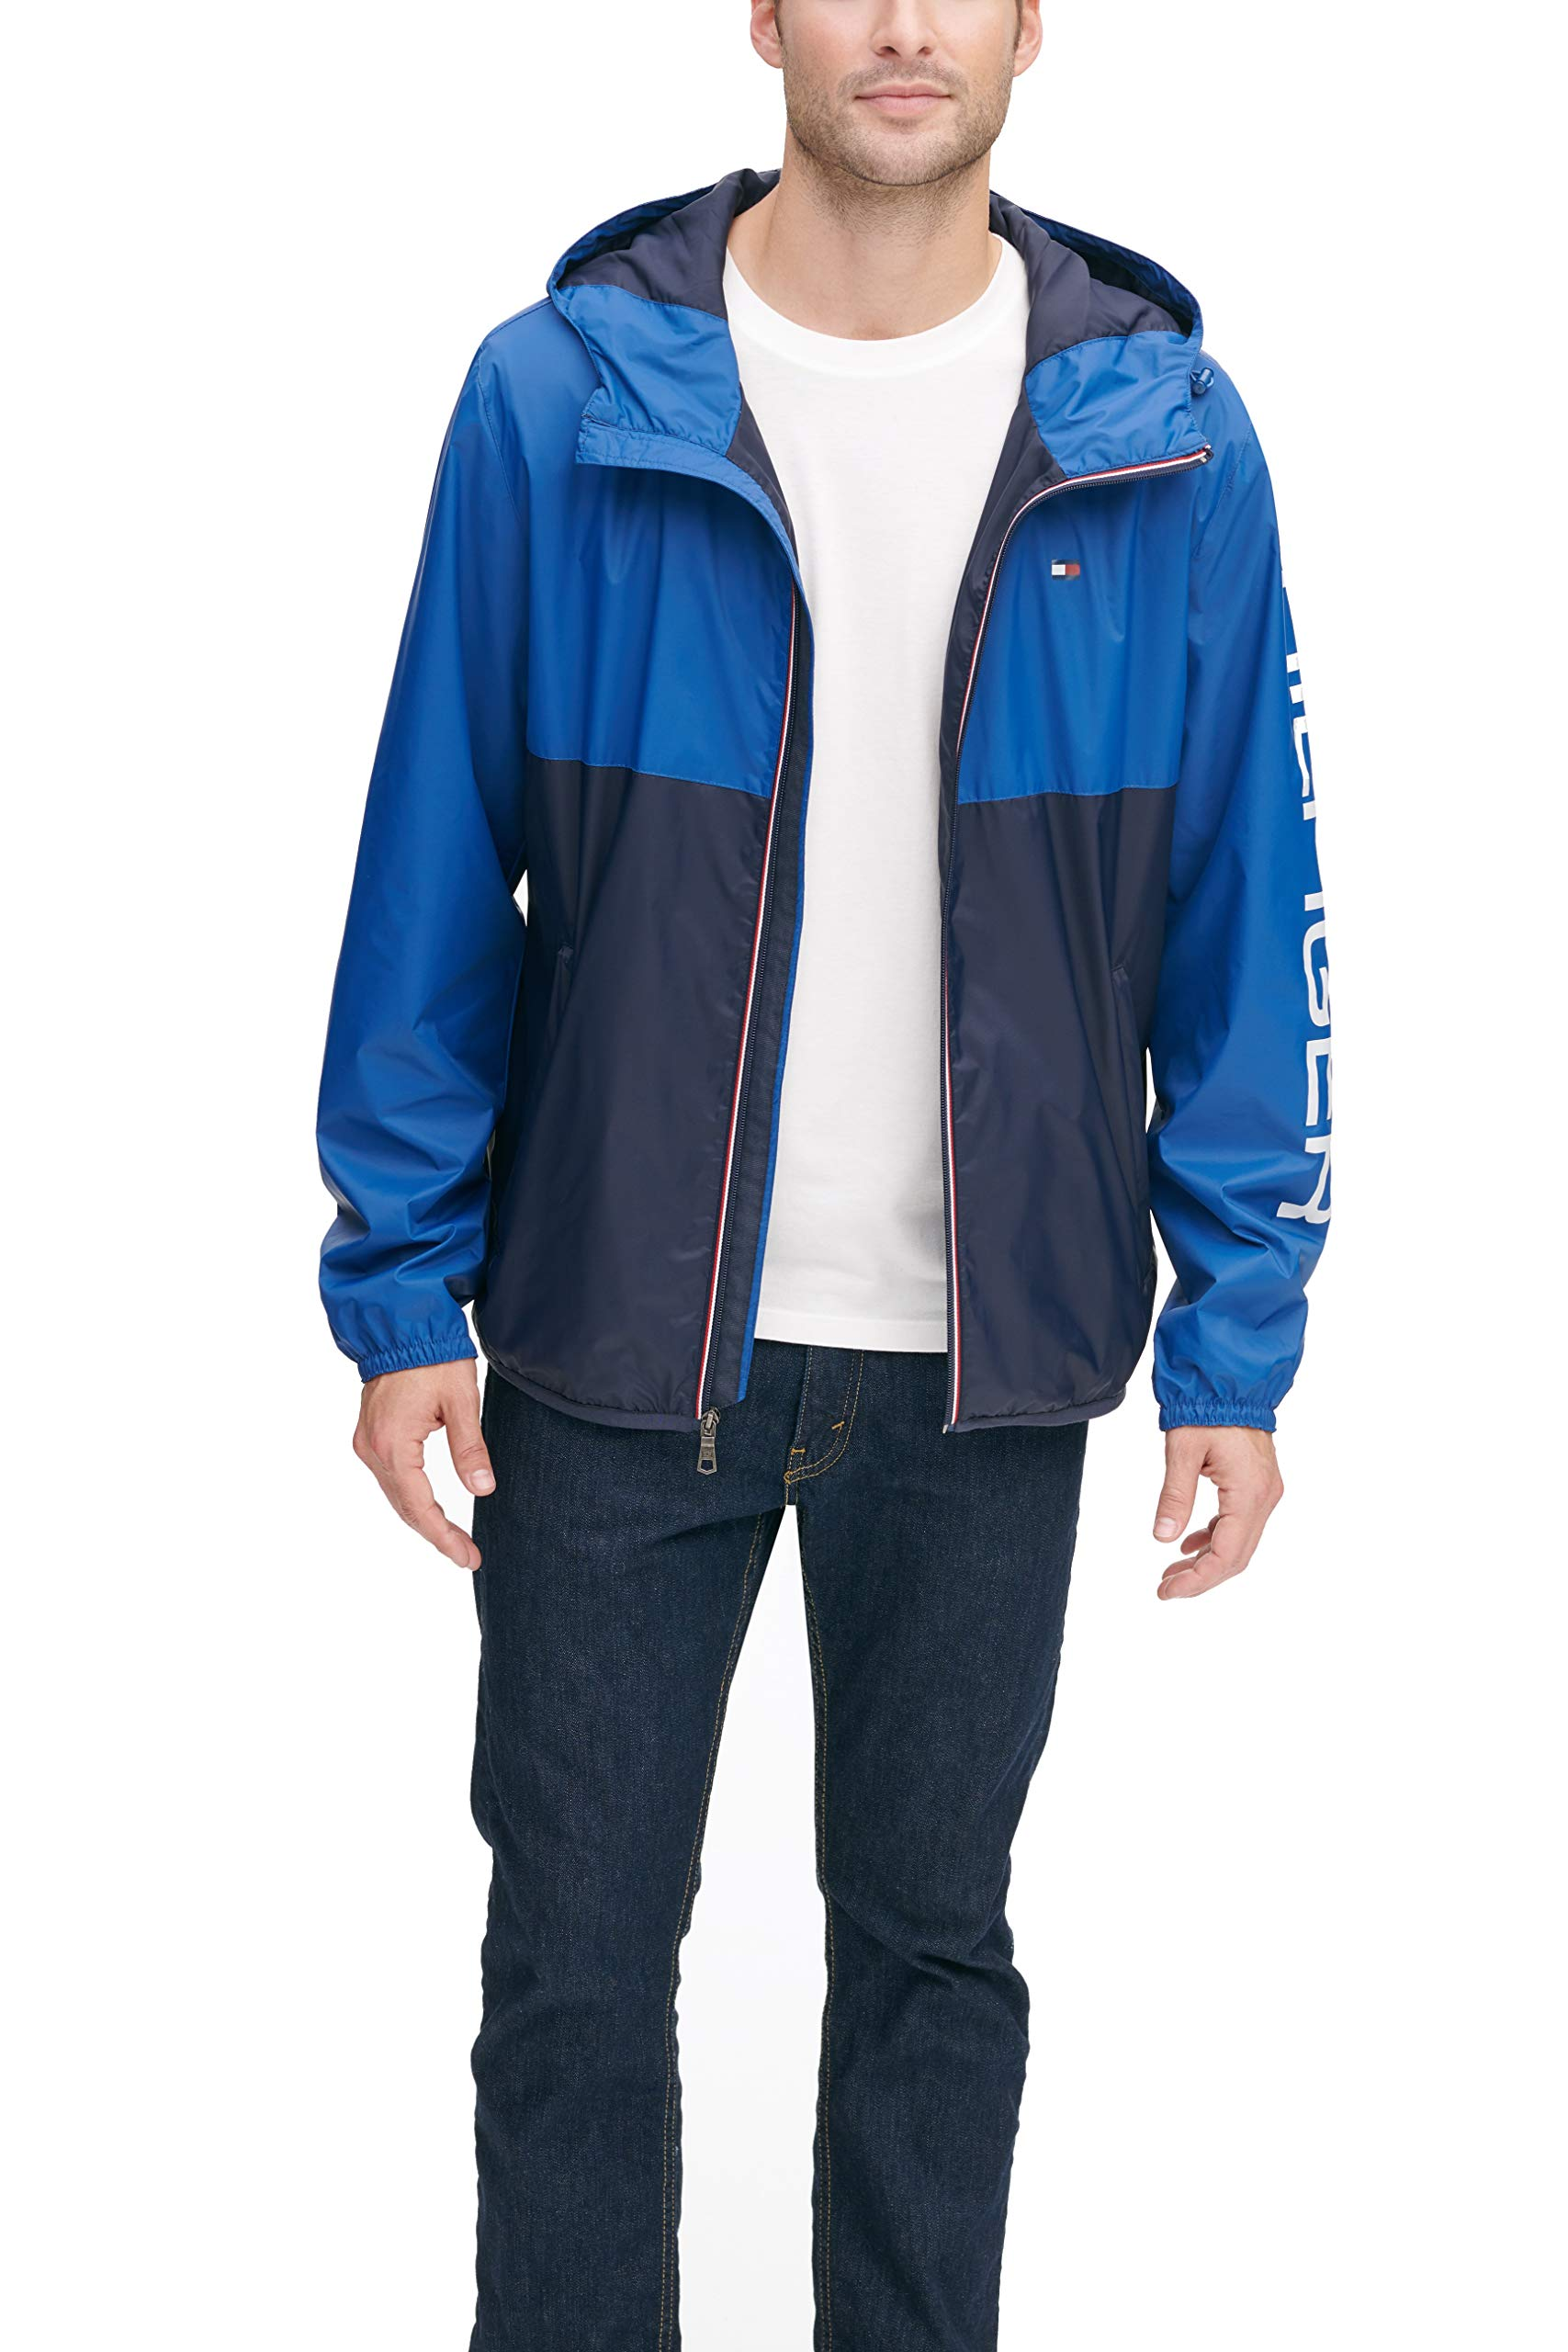 Tommy Hilfiger Men's Color Blocked Logo Rain Slicker Jacket, royal blue/navy, MEDIUM by Tommy Hilfiger